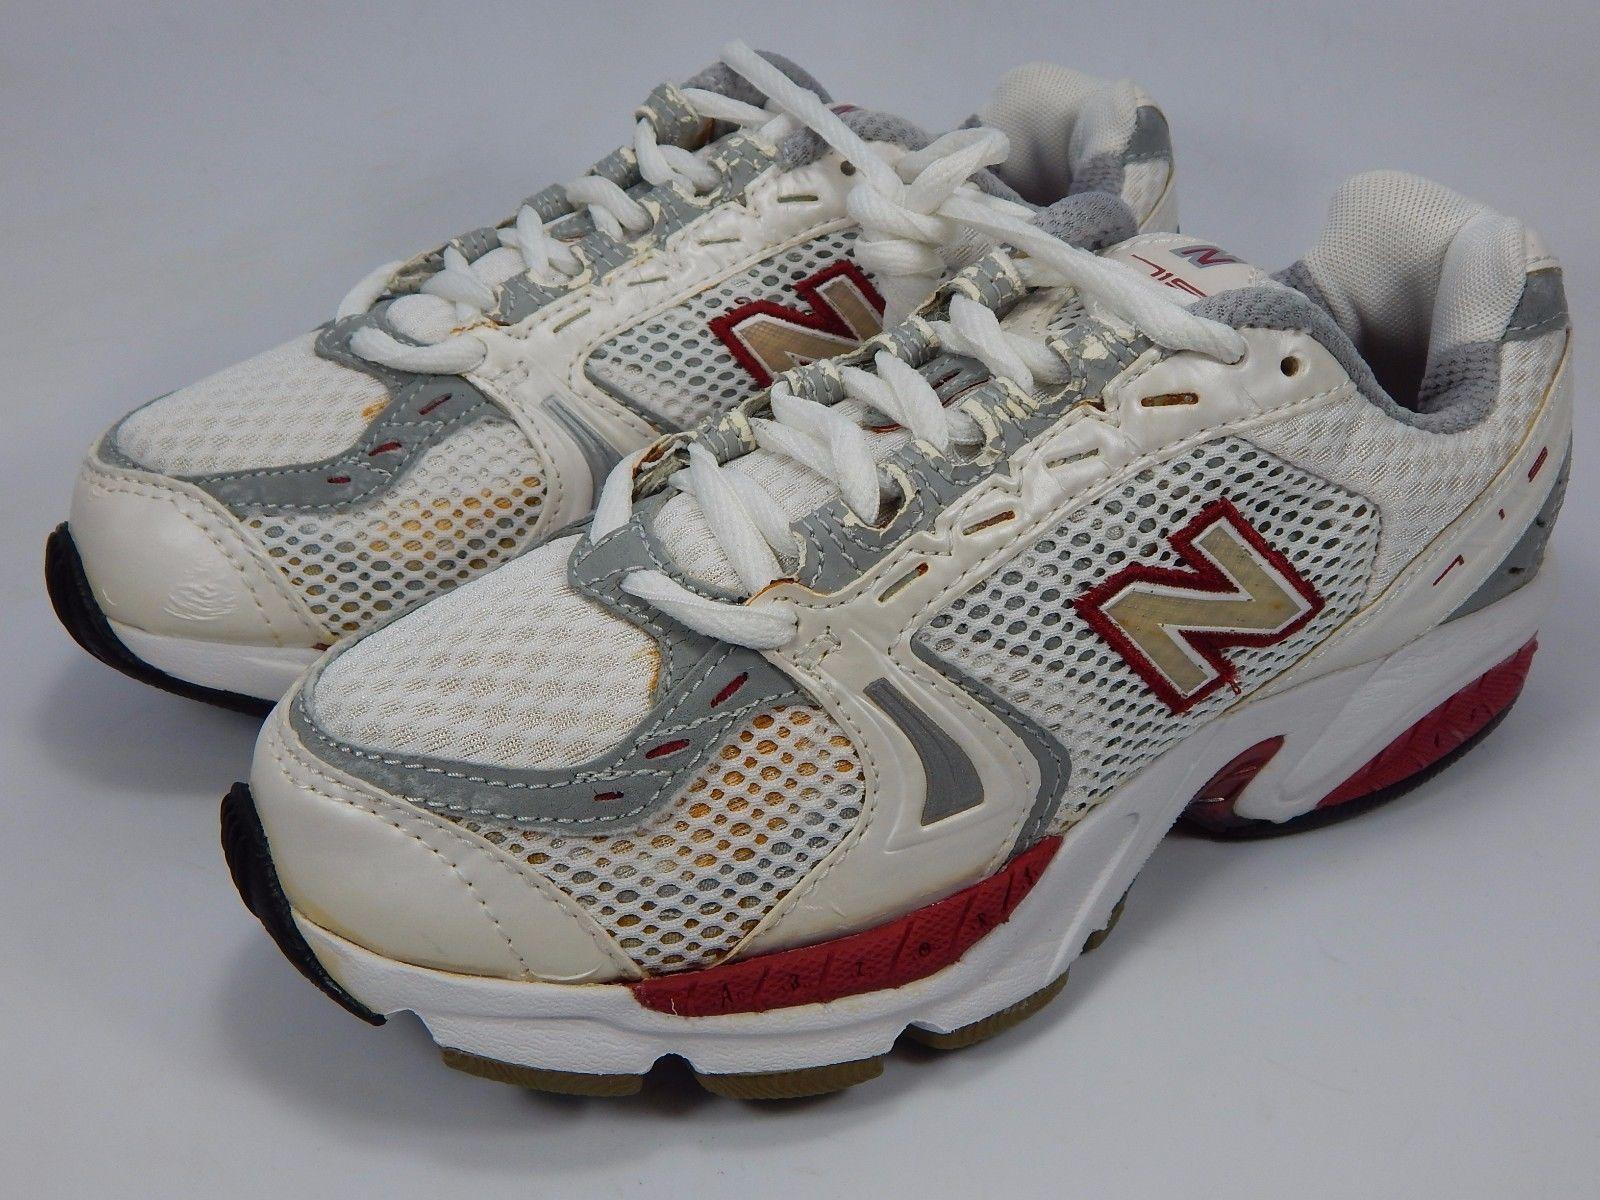 New Balance 719 Women's Running Shoes Size US 6 M (B) EU 36.5 White Red W719WR